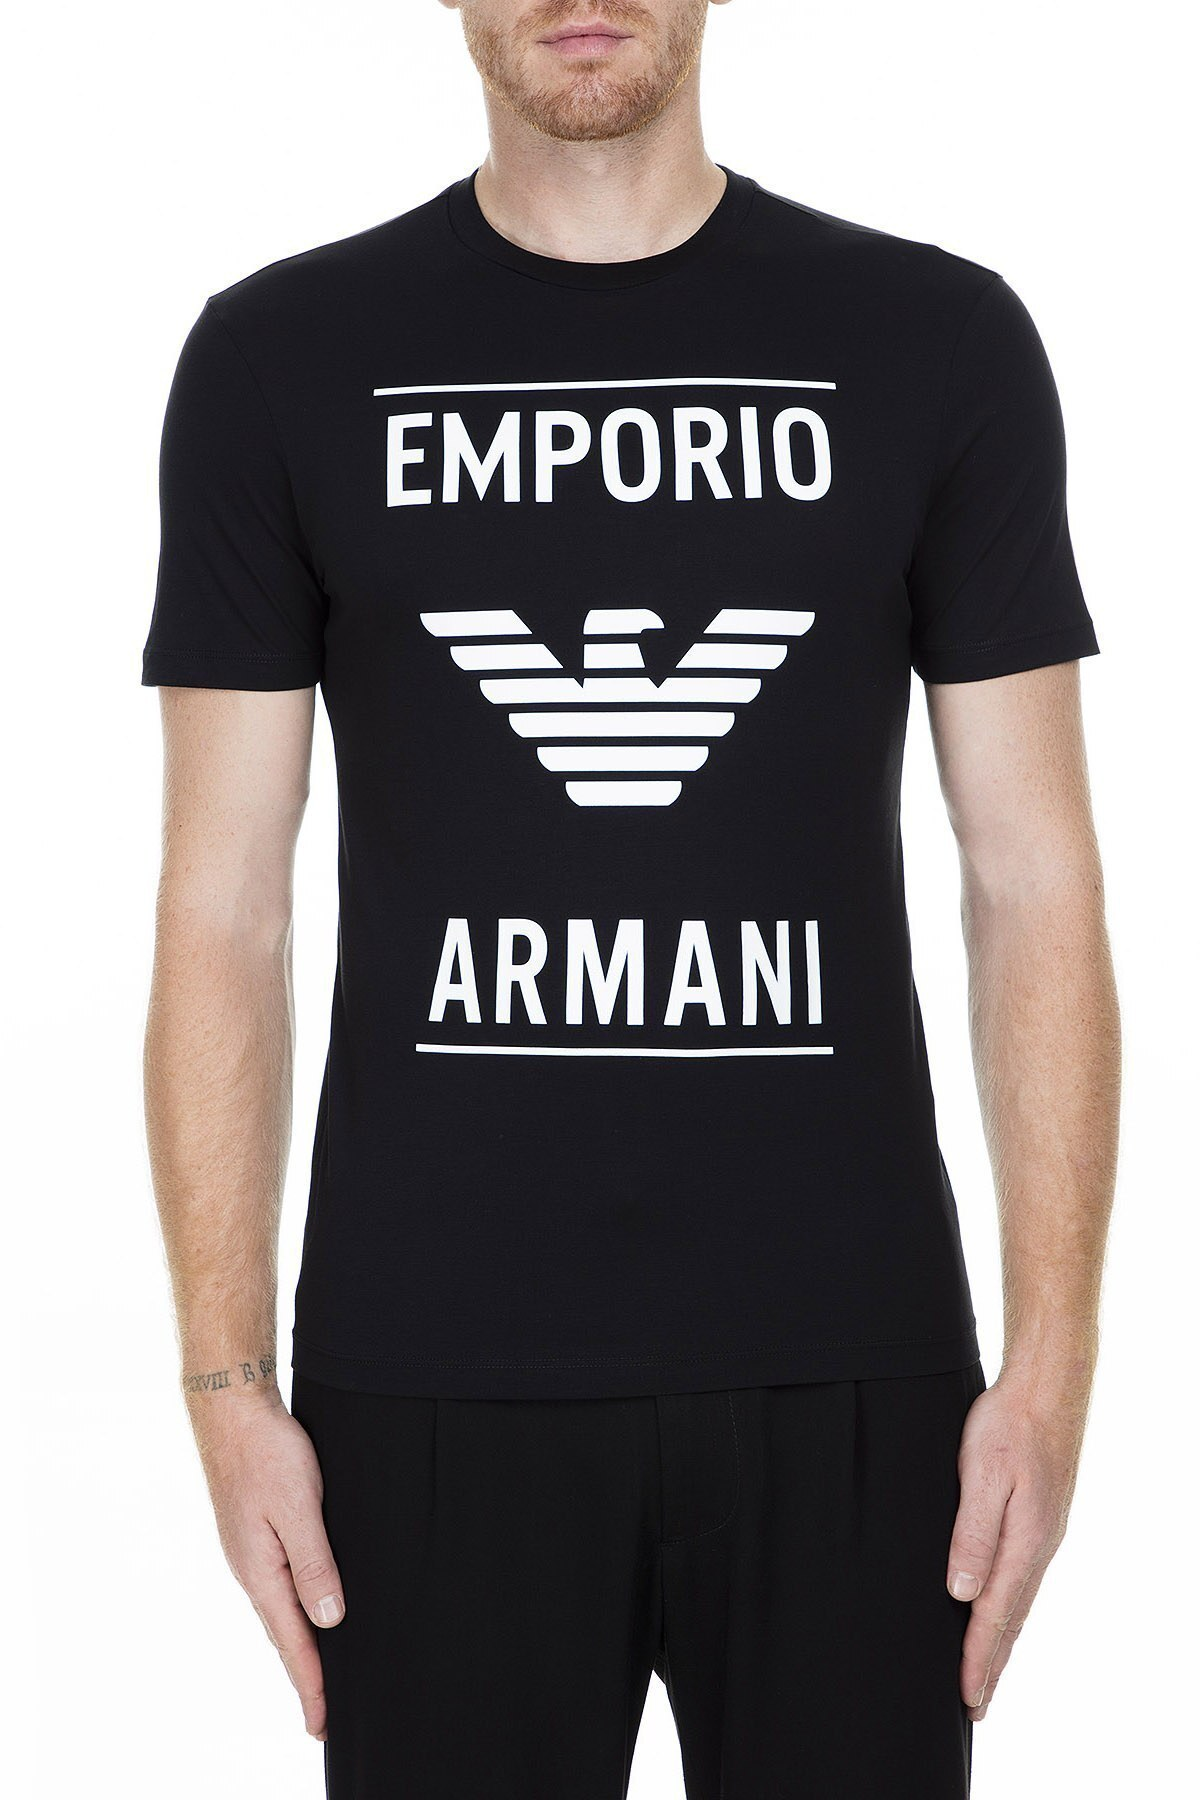 Emporio Armani Erkek T Shirt 6G1TE7 1JNQZ 0999 SİYAH